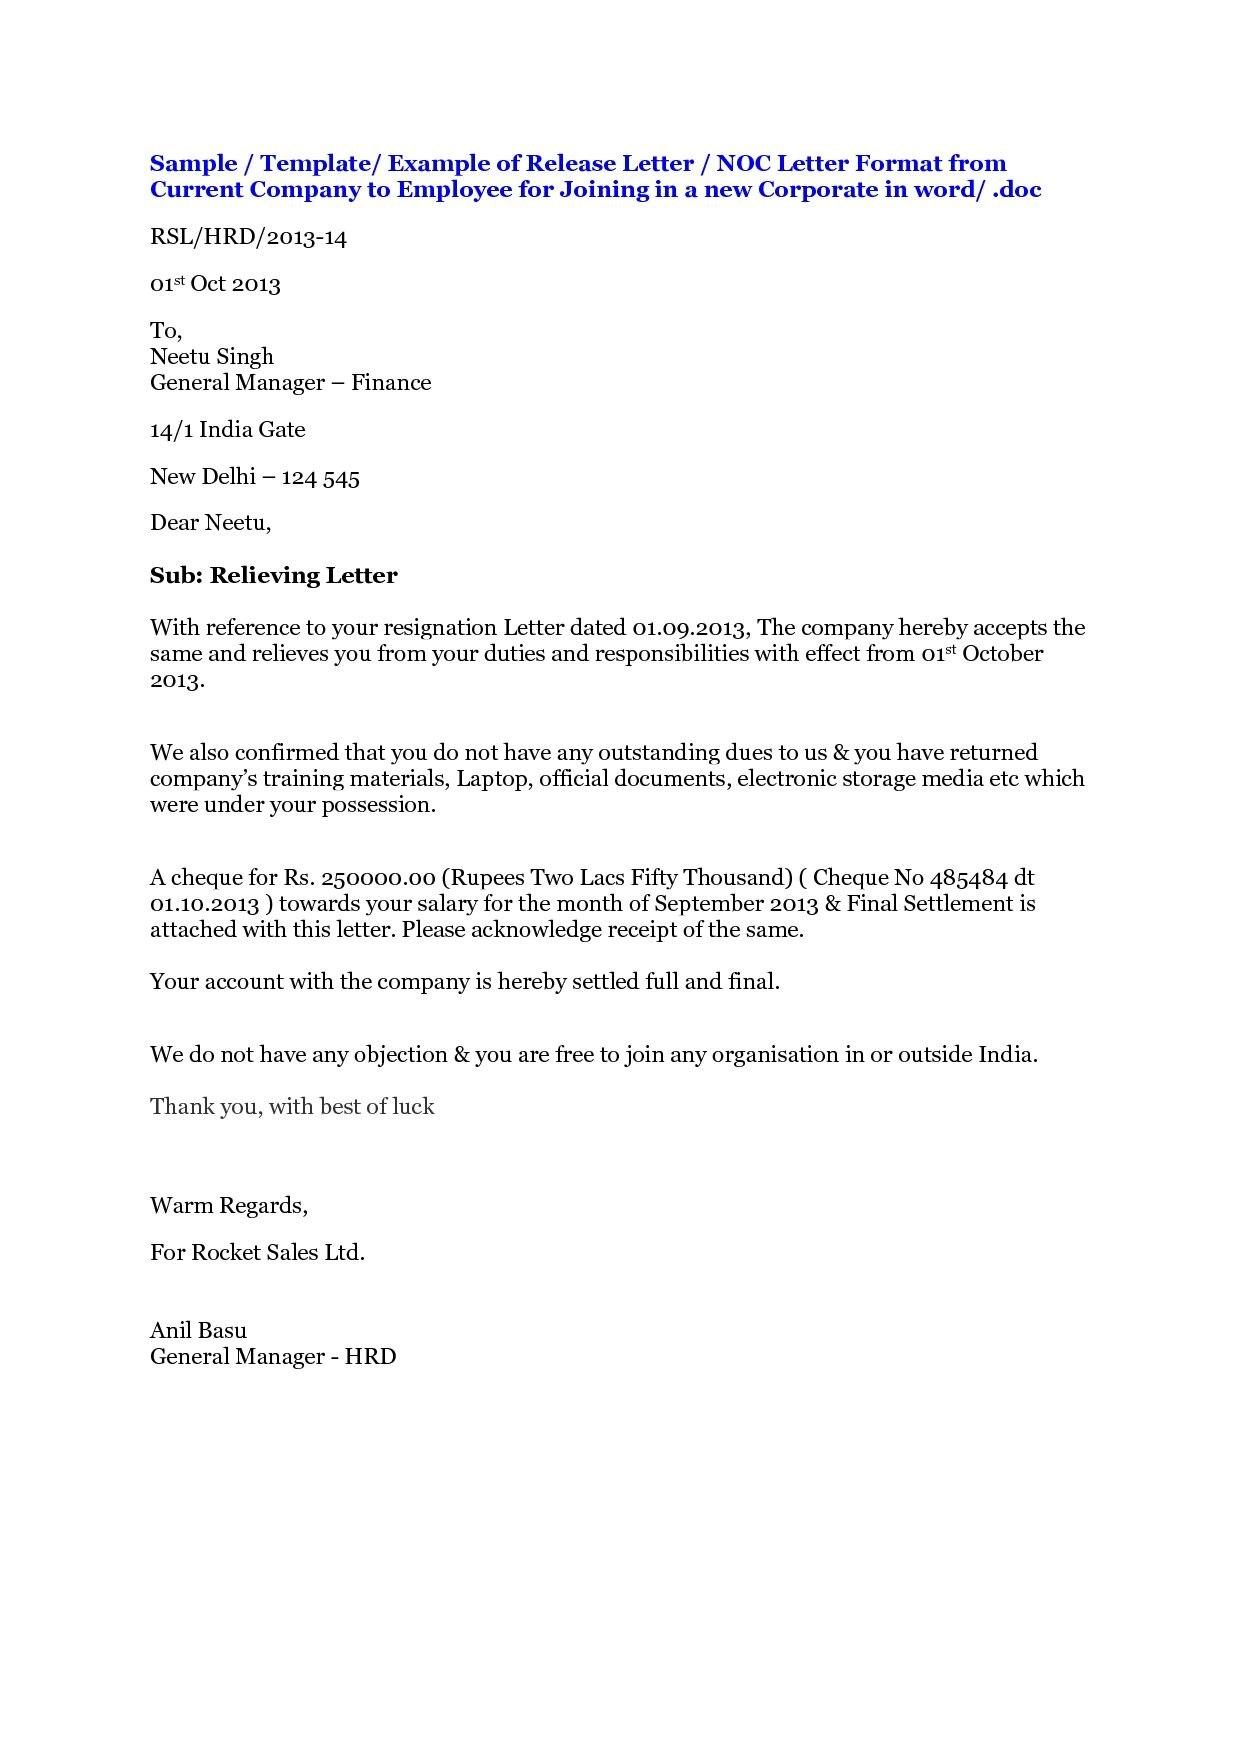 No Objection Letter Format For Employer Shopgrat  Krishna Kanta Bag Inside Letter Of Objection Template